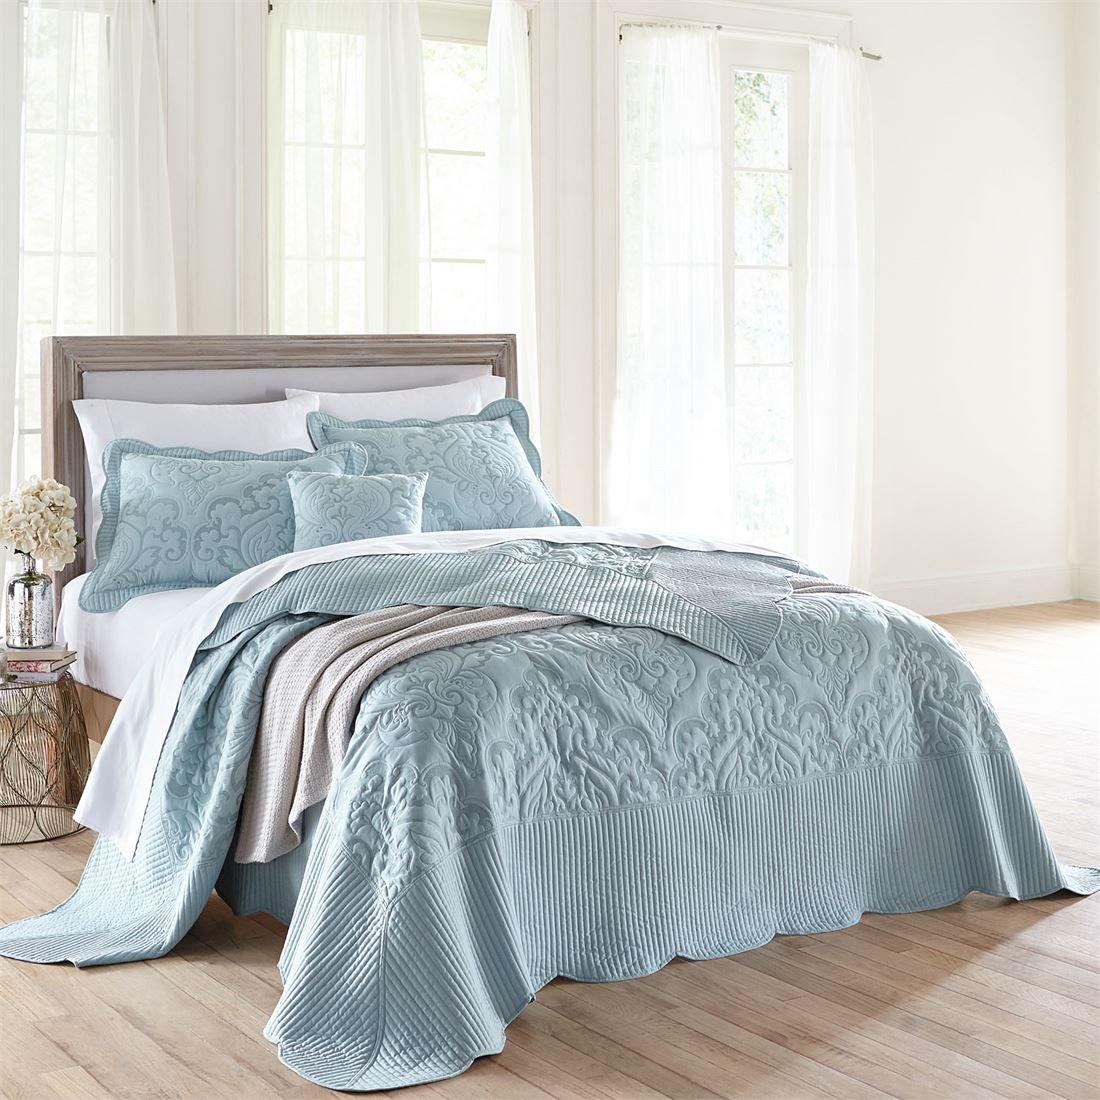 BrylaneHome Amelia Bedspread (Seaglass,Queen)